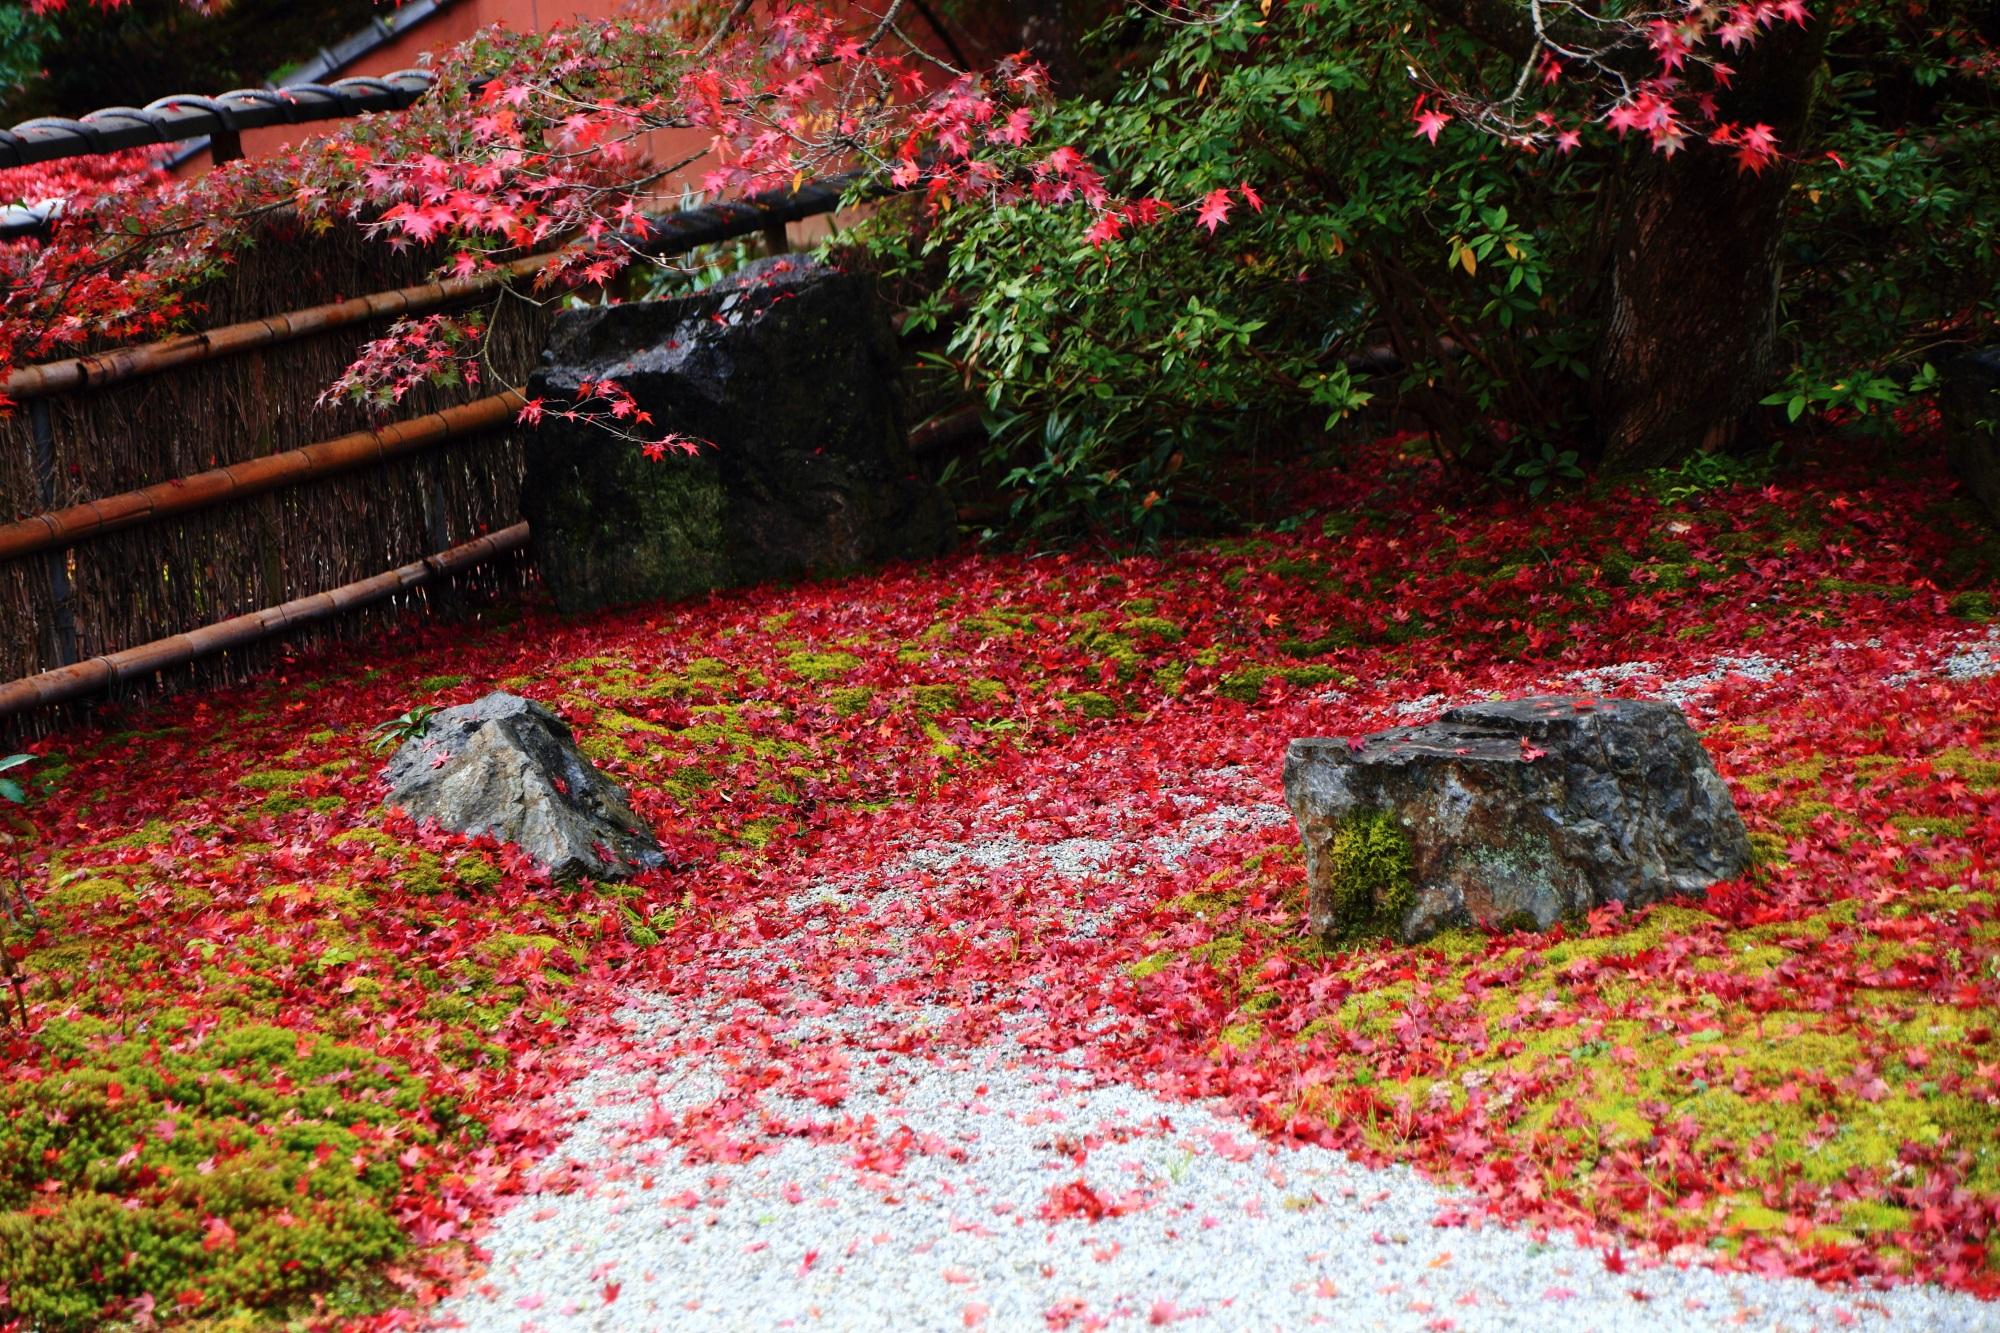 直指庵 阿弥陀堂 庭園 白砂 苔 散り紅葉